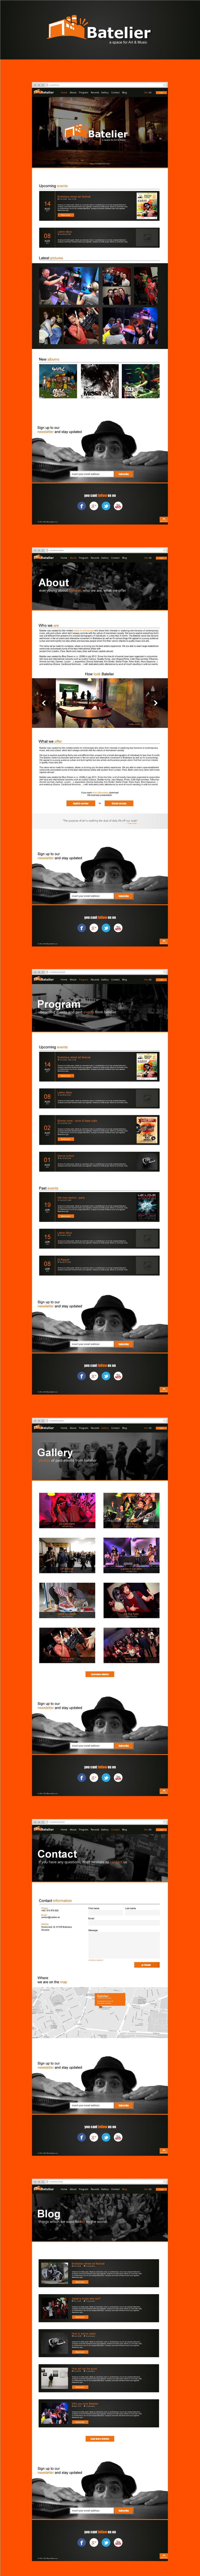 Web design for Batelier